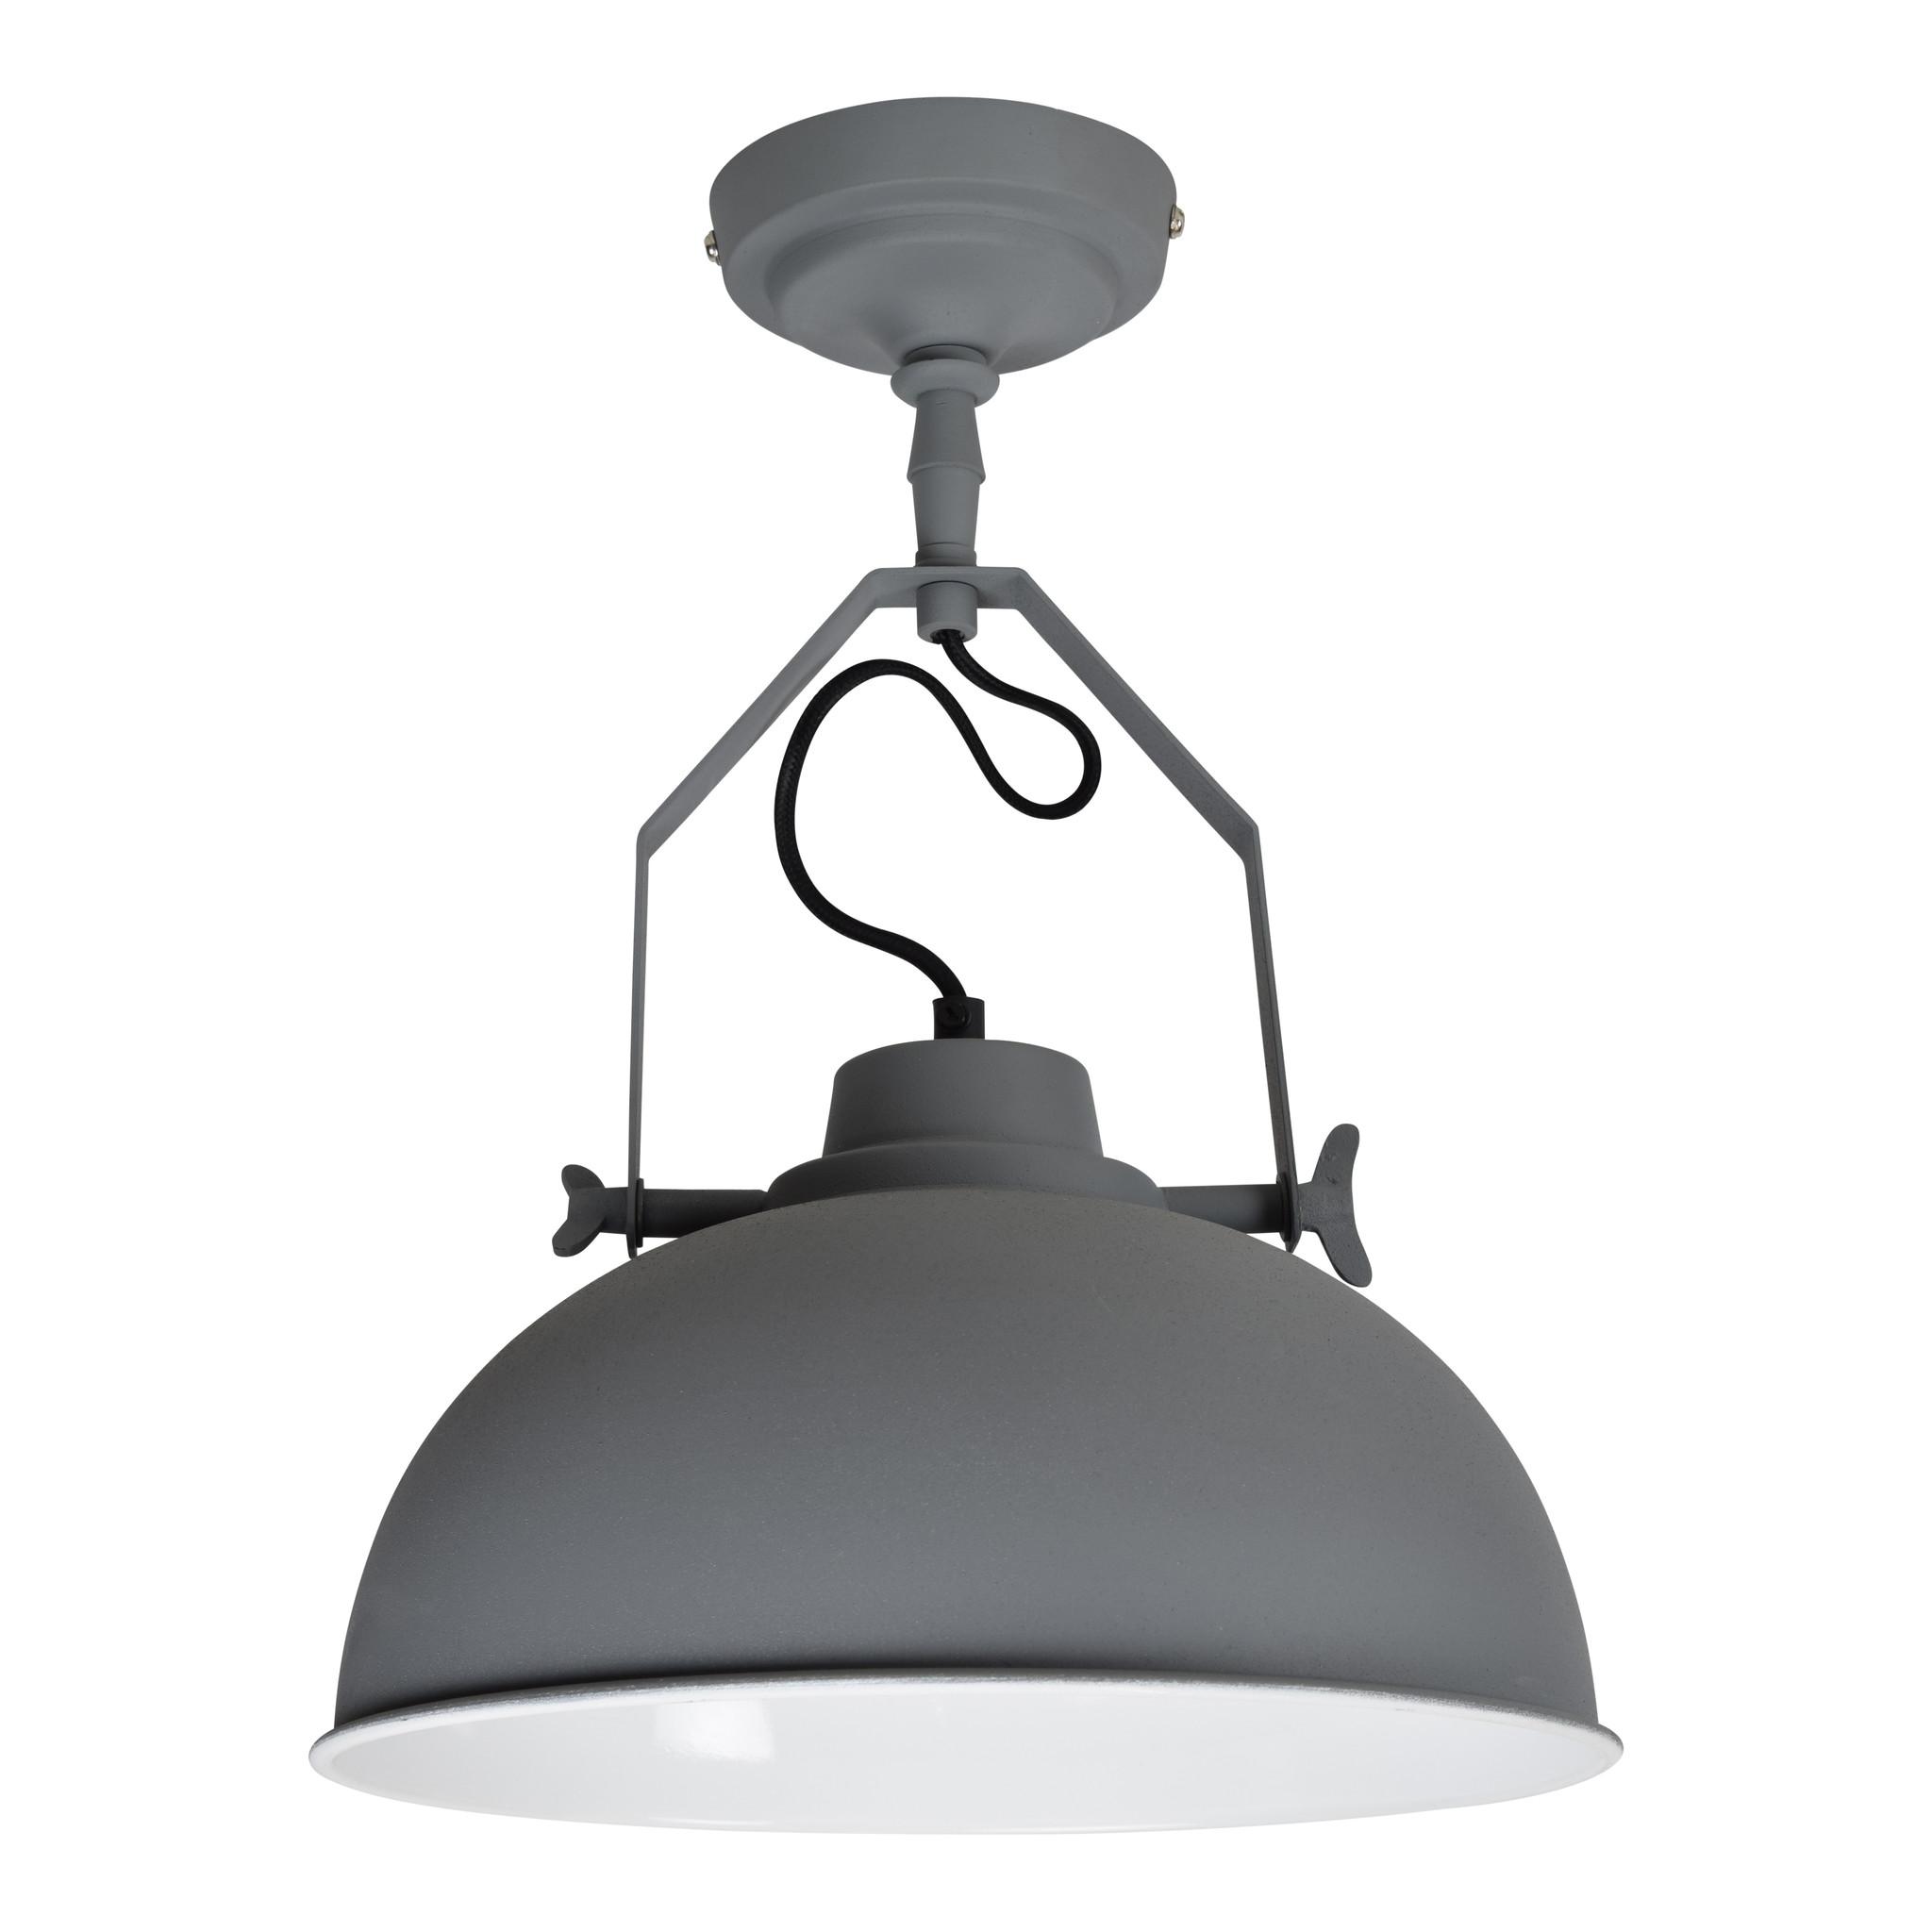 Urban Interiors Urban Interiors Plafondlamp Urban ø30 cm Vintage grey